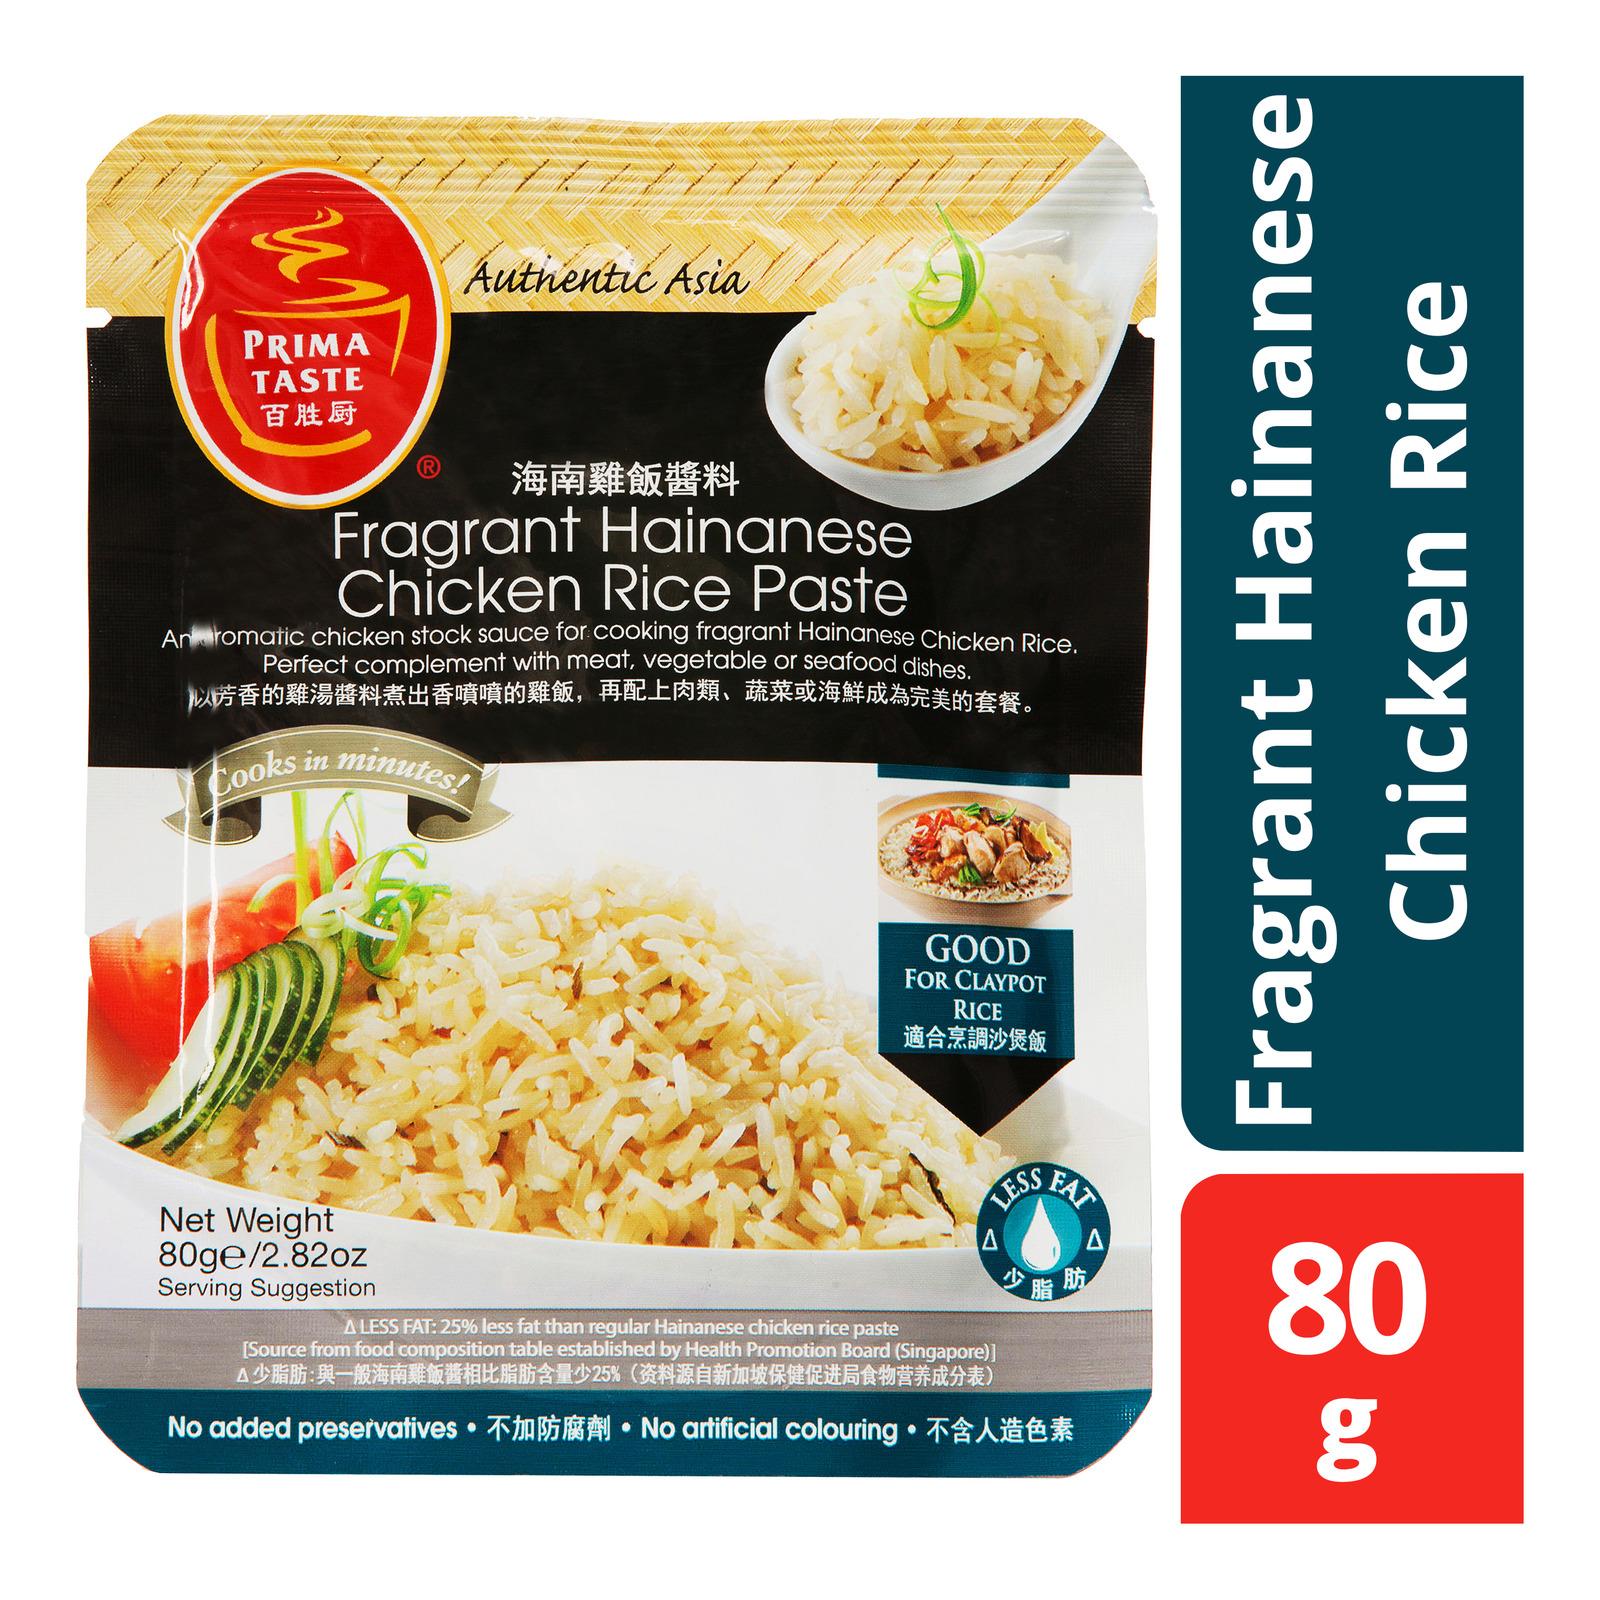 Prima Taste Paste - Fragrant Hainanese Chicken Rice